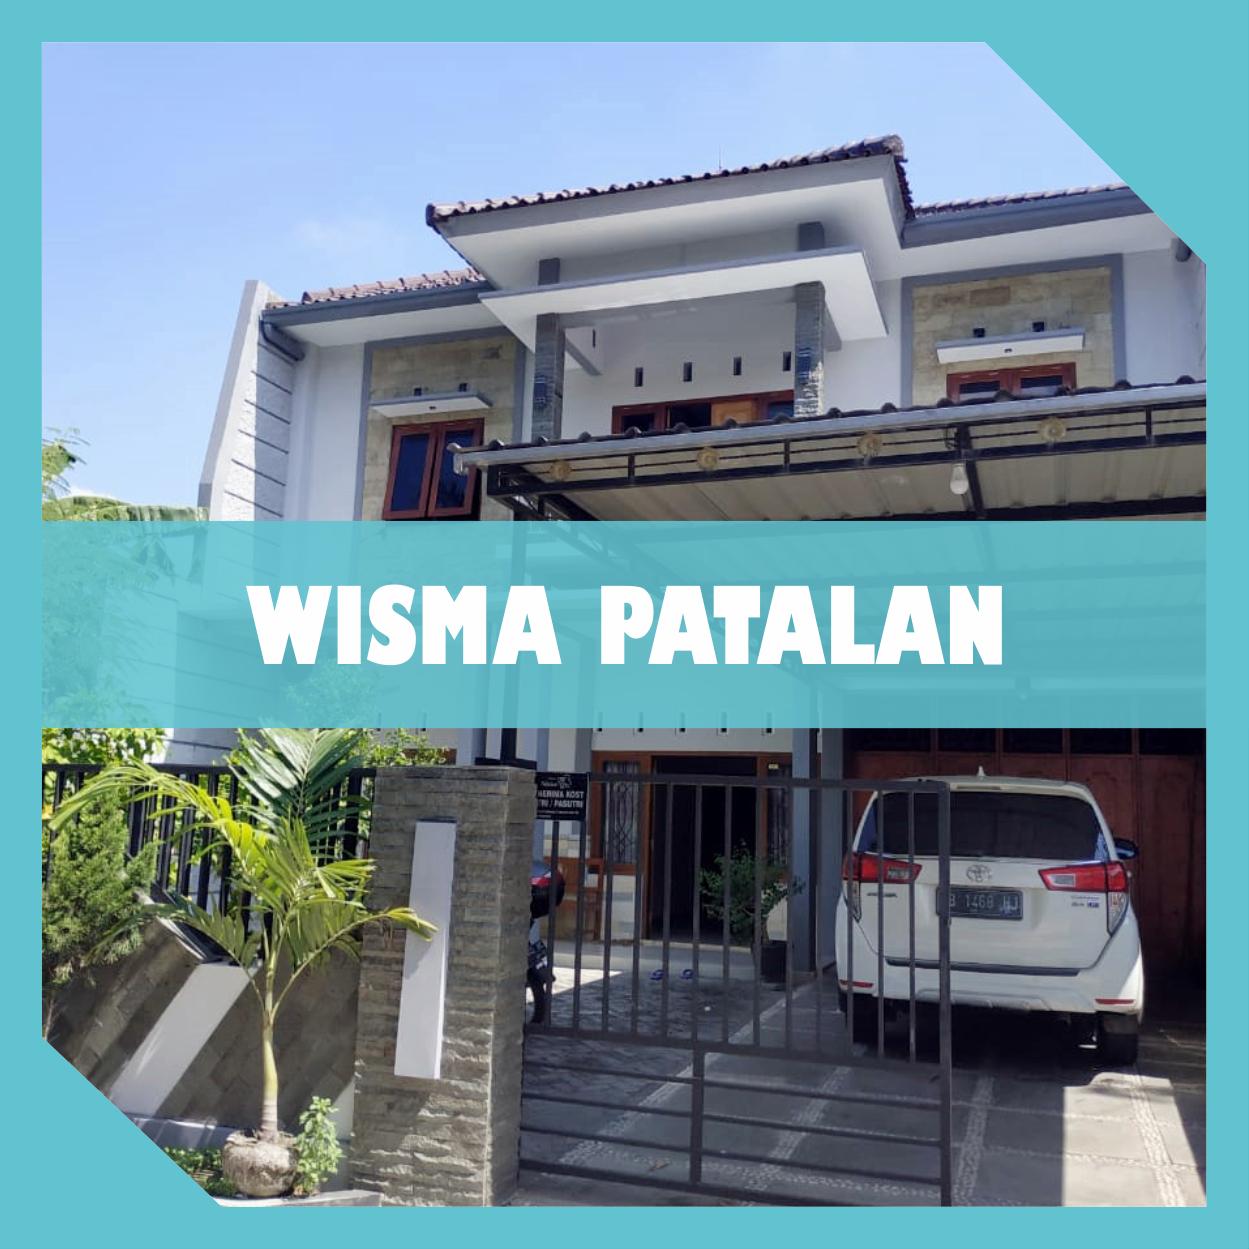 Wisma Patalan